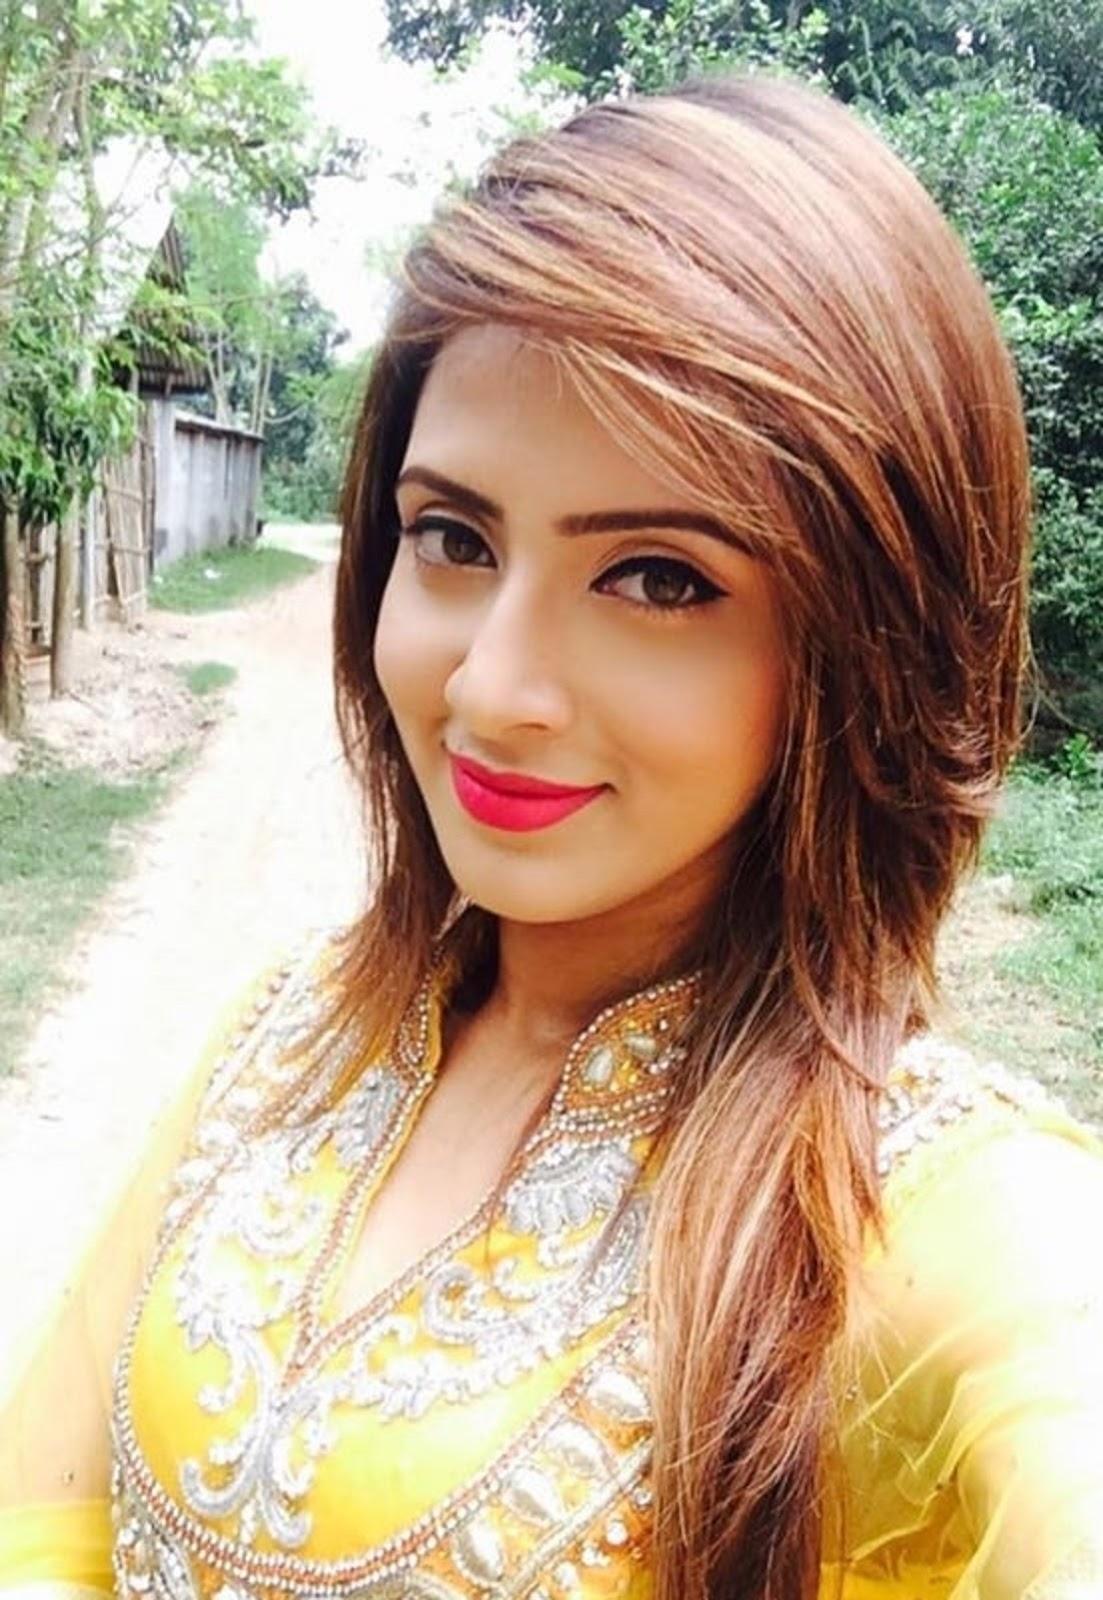 Bidya Sinha Saha Mim Wiki, Biography, Dob, Age, Height, Weight, Affairs and More